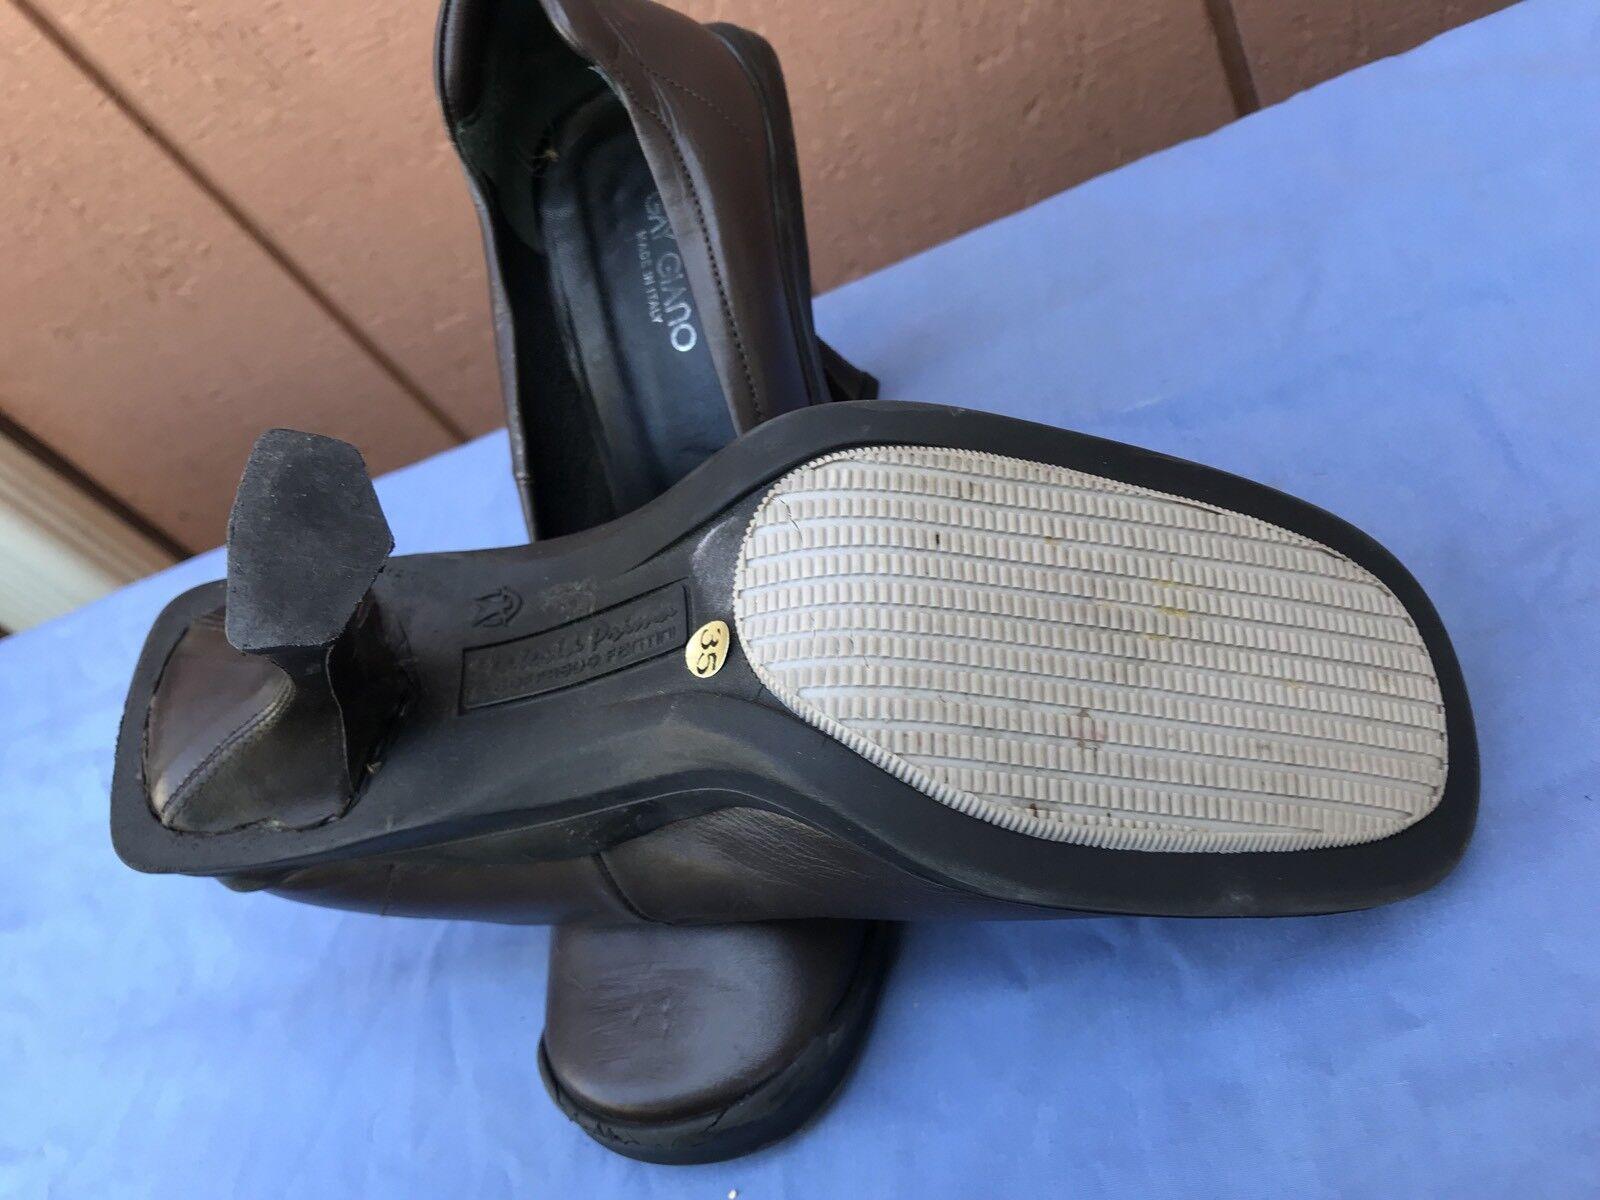 GAY GIANO 35 35 35 US 5 Braun Leder Fashion Pumps Heels 190 A4 74d765